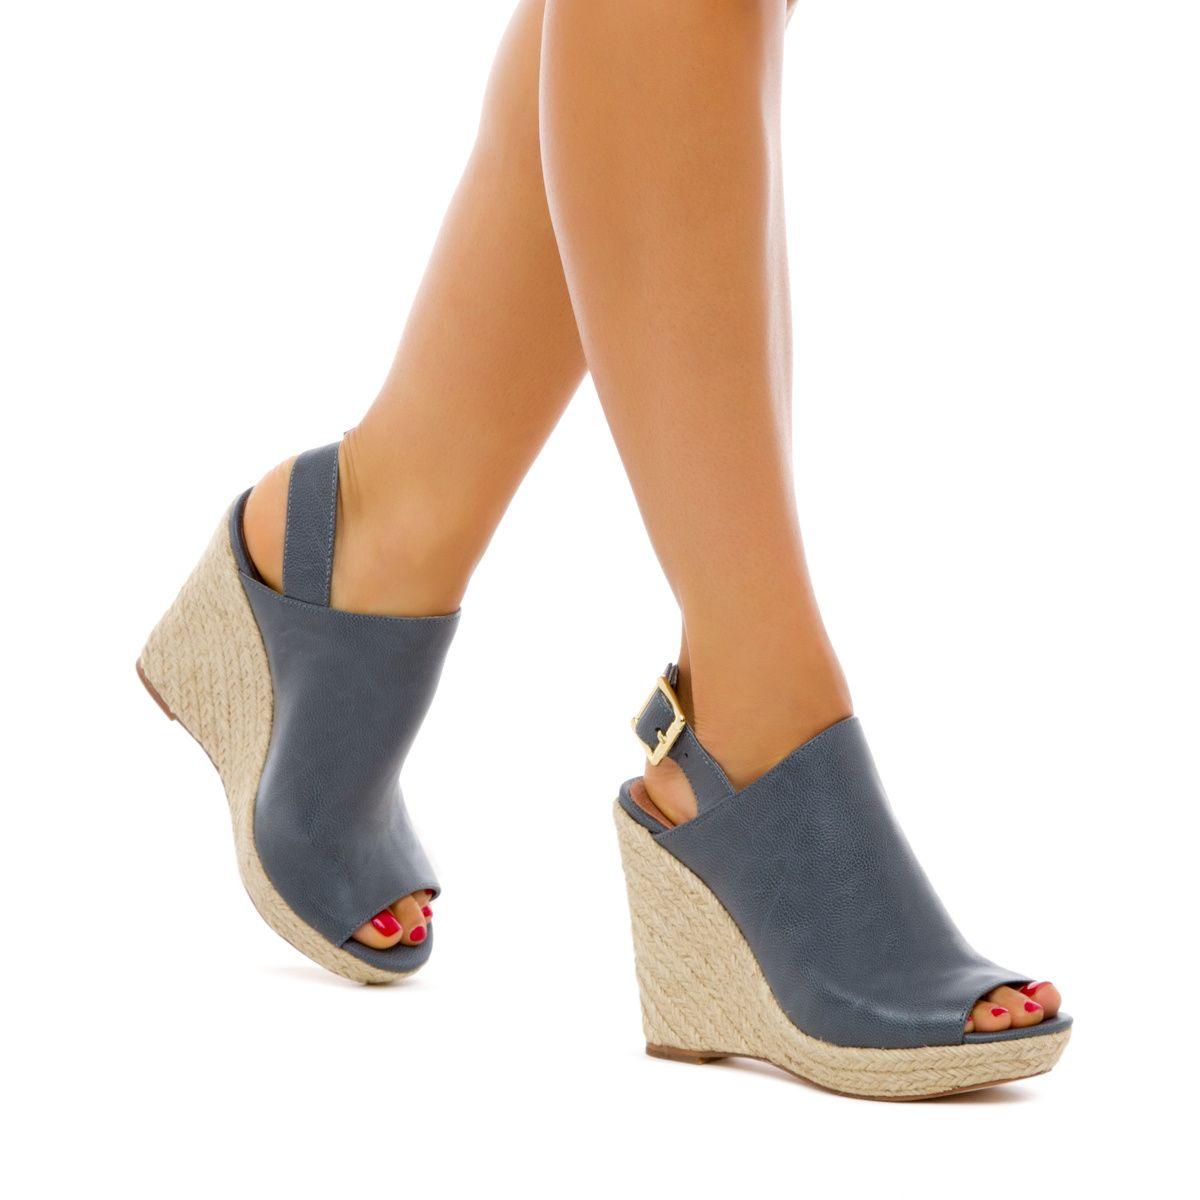 Women's Shoes, Boots, Wedges, Pumps, Flats, Sandals, and Handbags